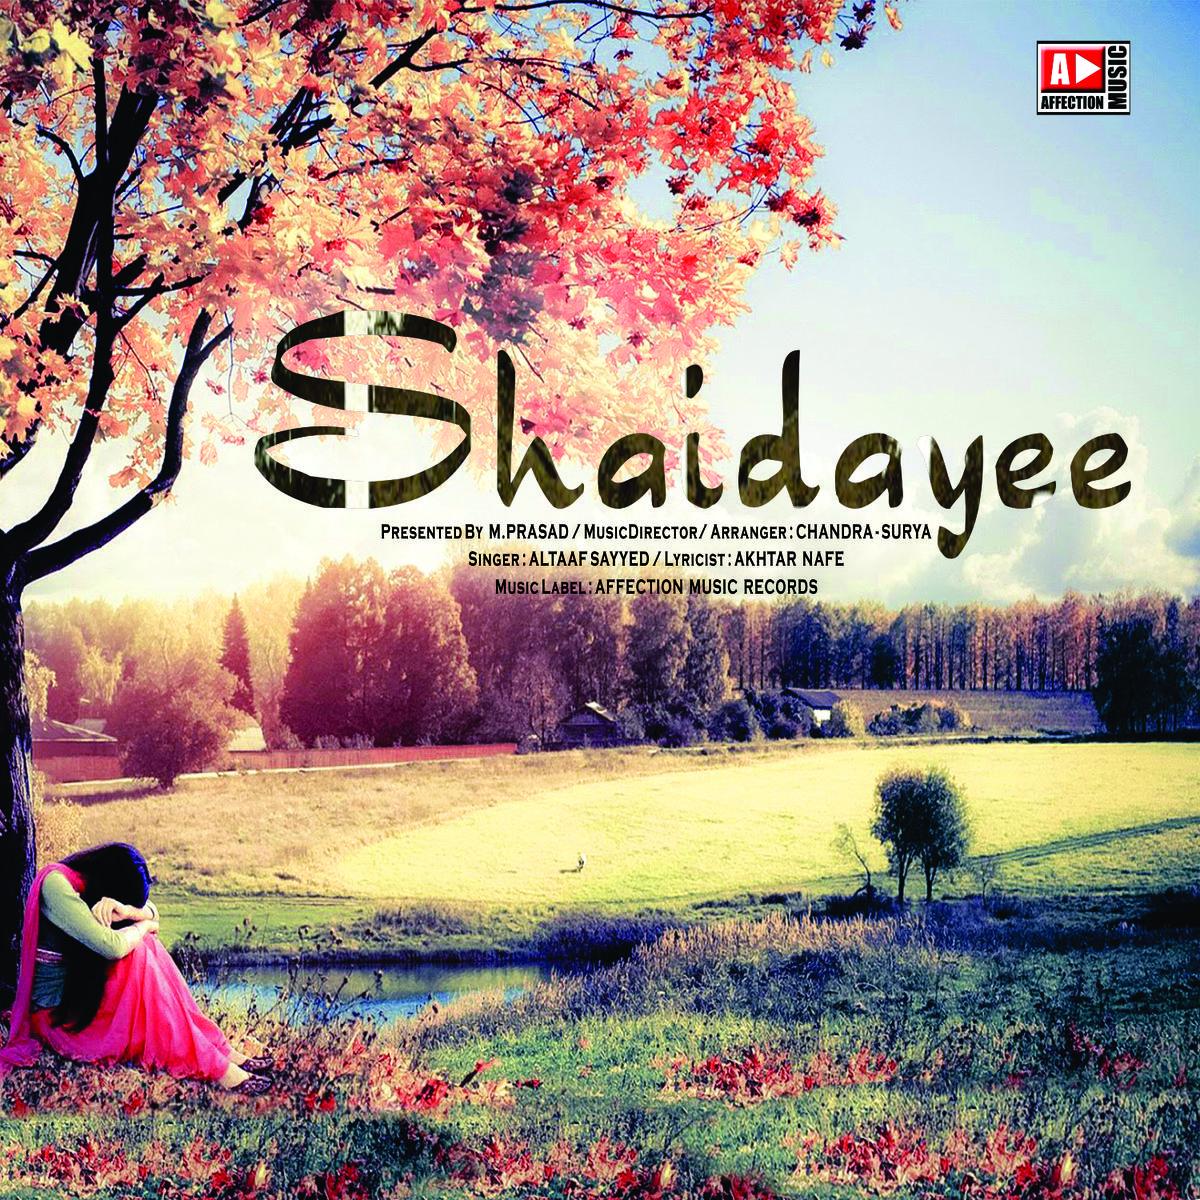 Shaidayee Song Download: Shaidayee MP3 Song Online Free on Gaana.com